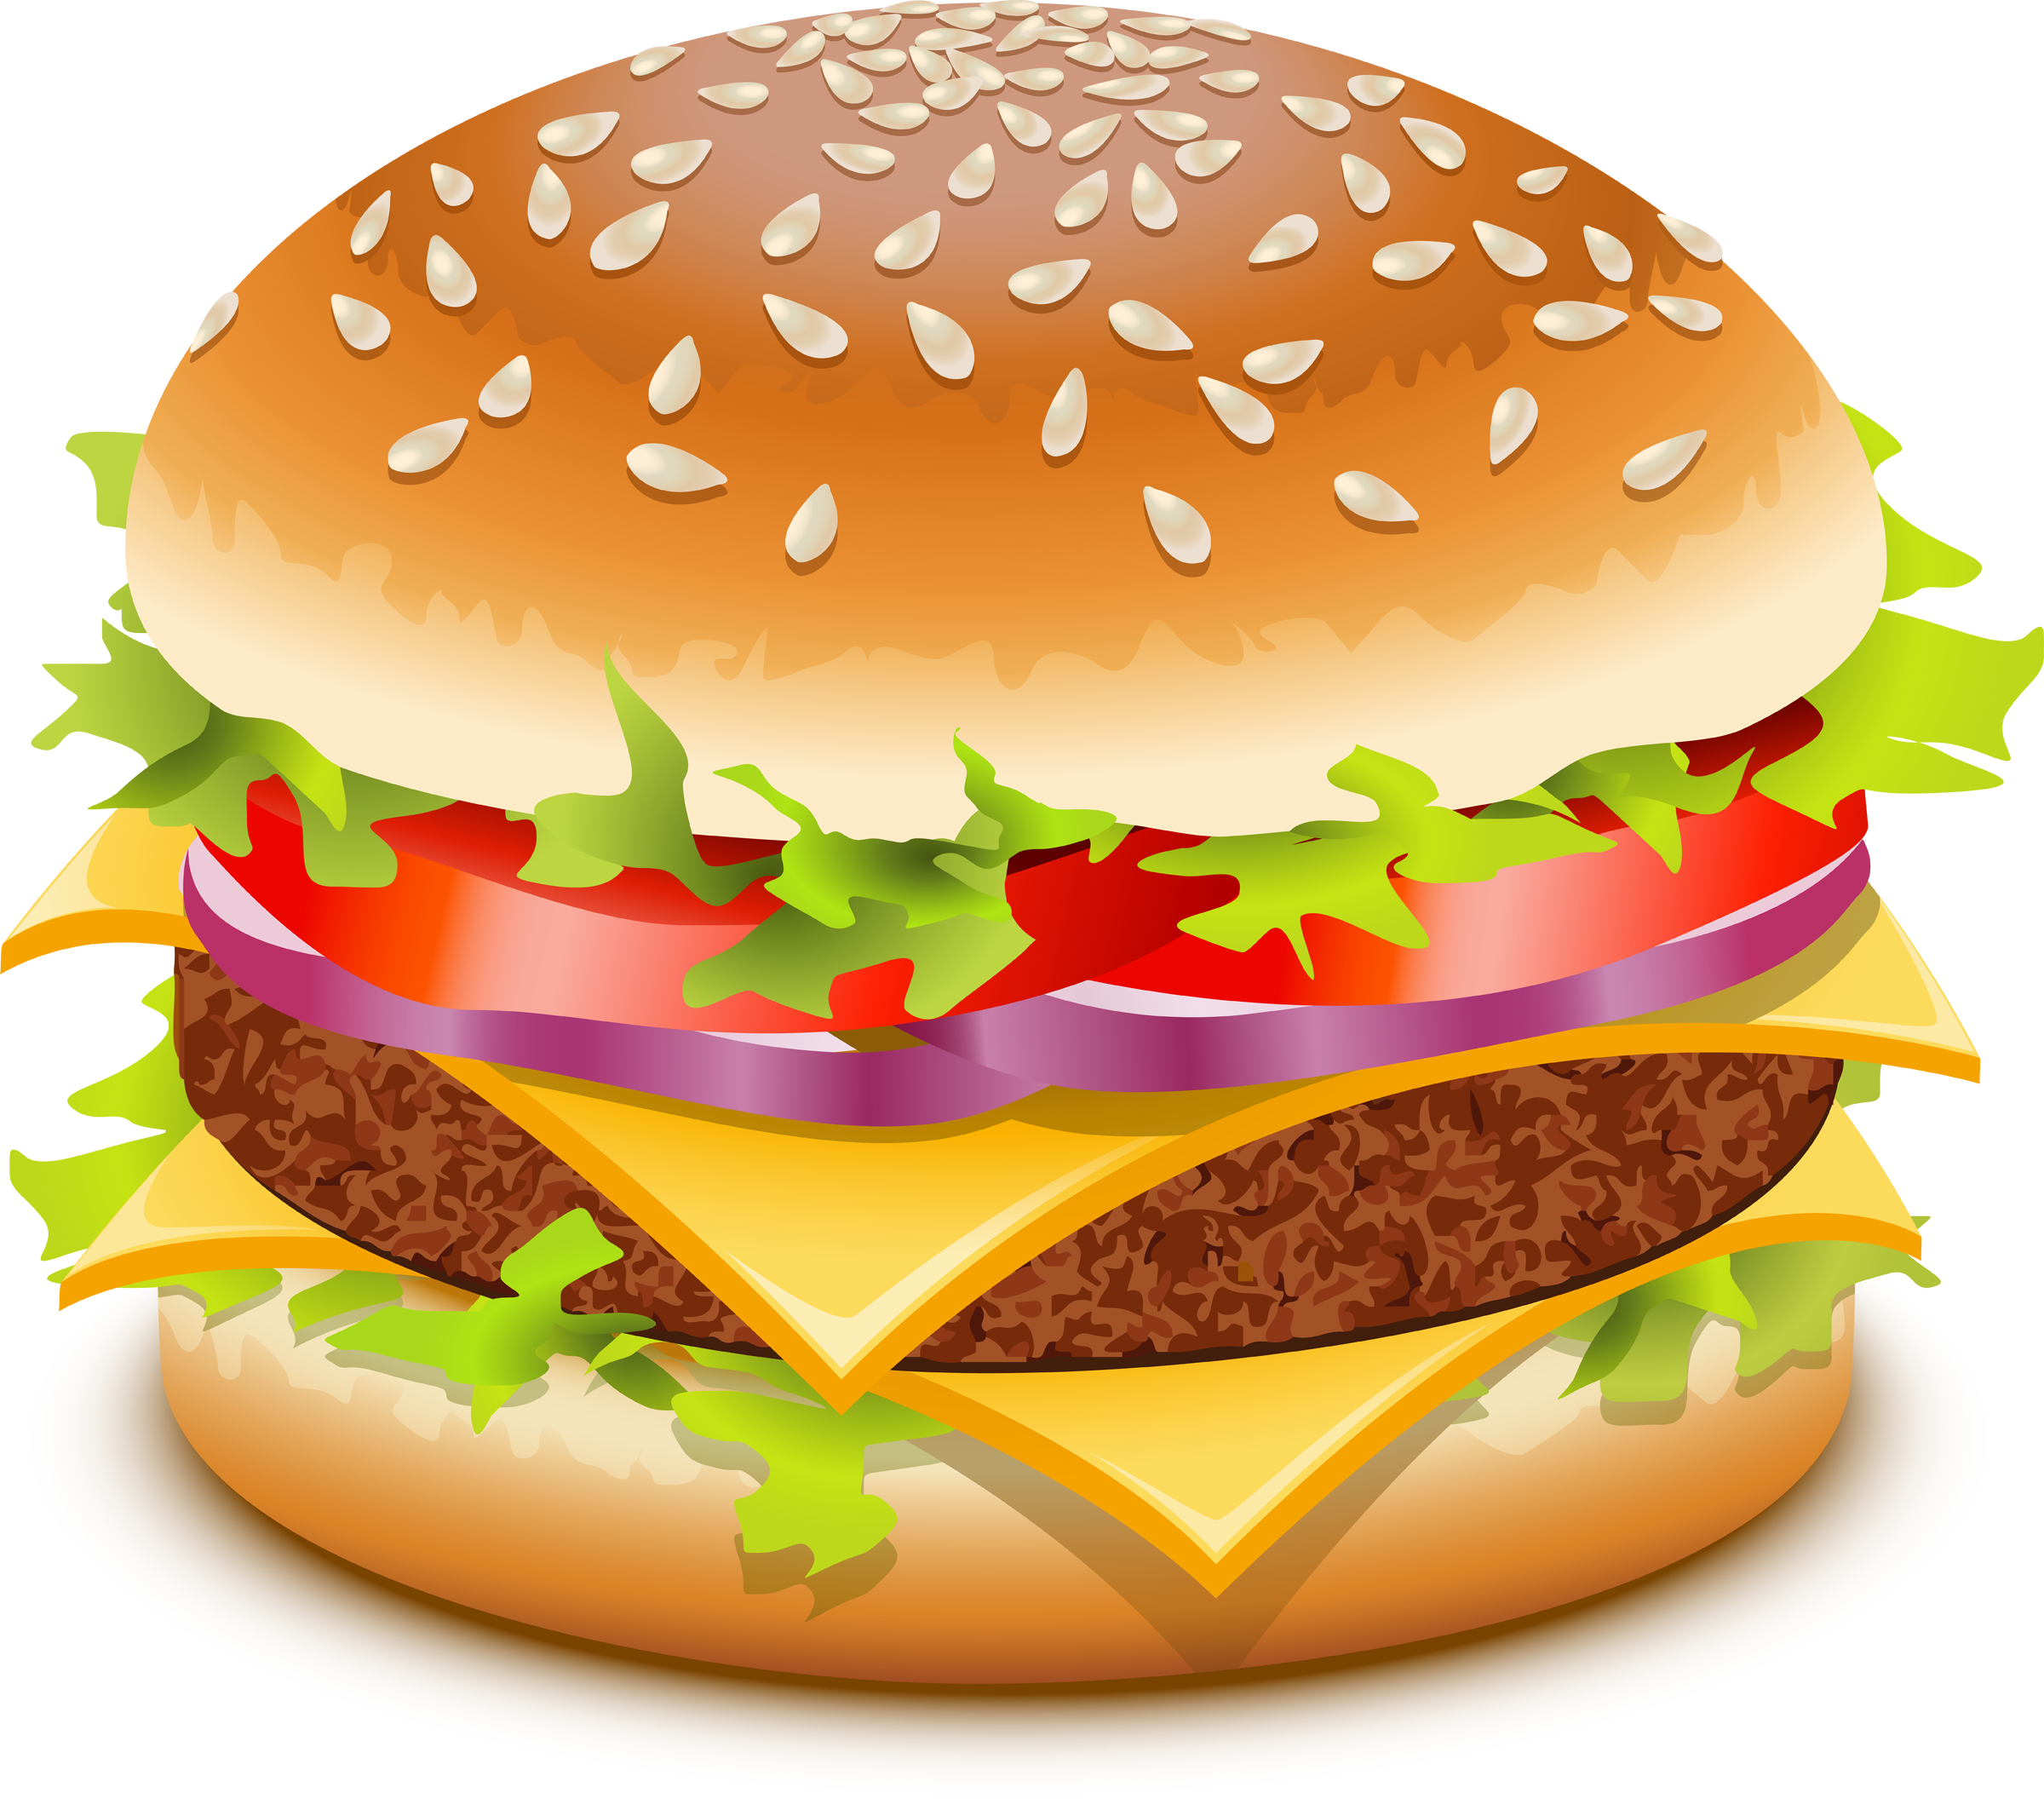 Hamburger and hot dog clipart vector royalty free download Free Clip art - Clip Art Collection - Download Clipart on Clipart ... vector royalty free download